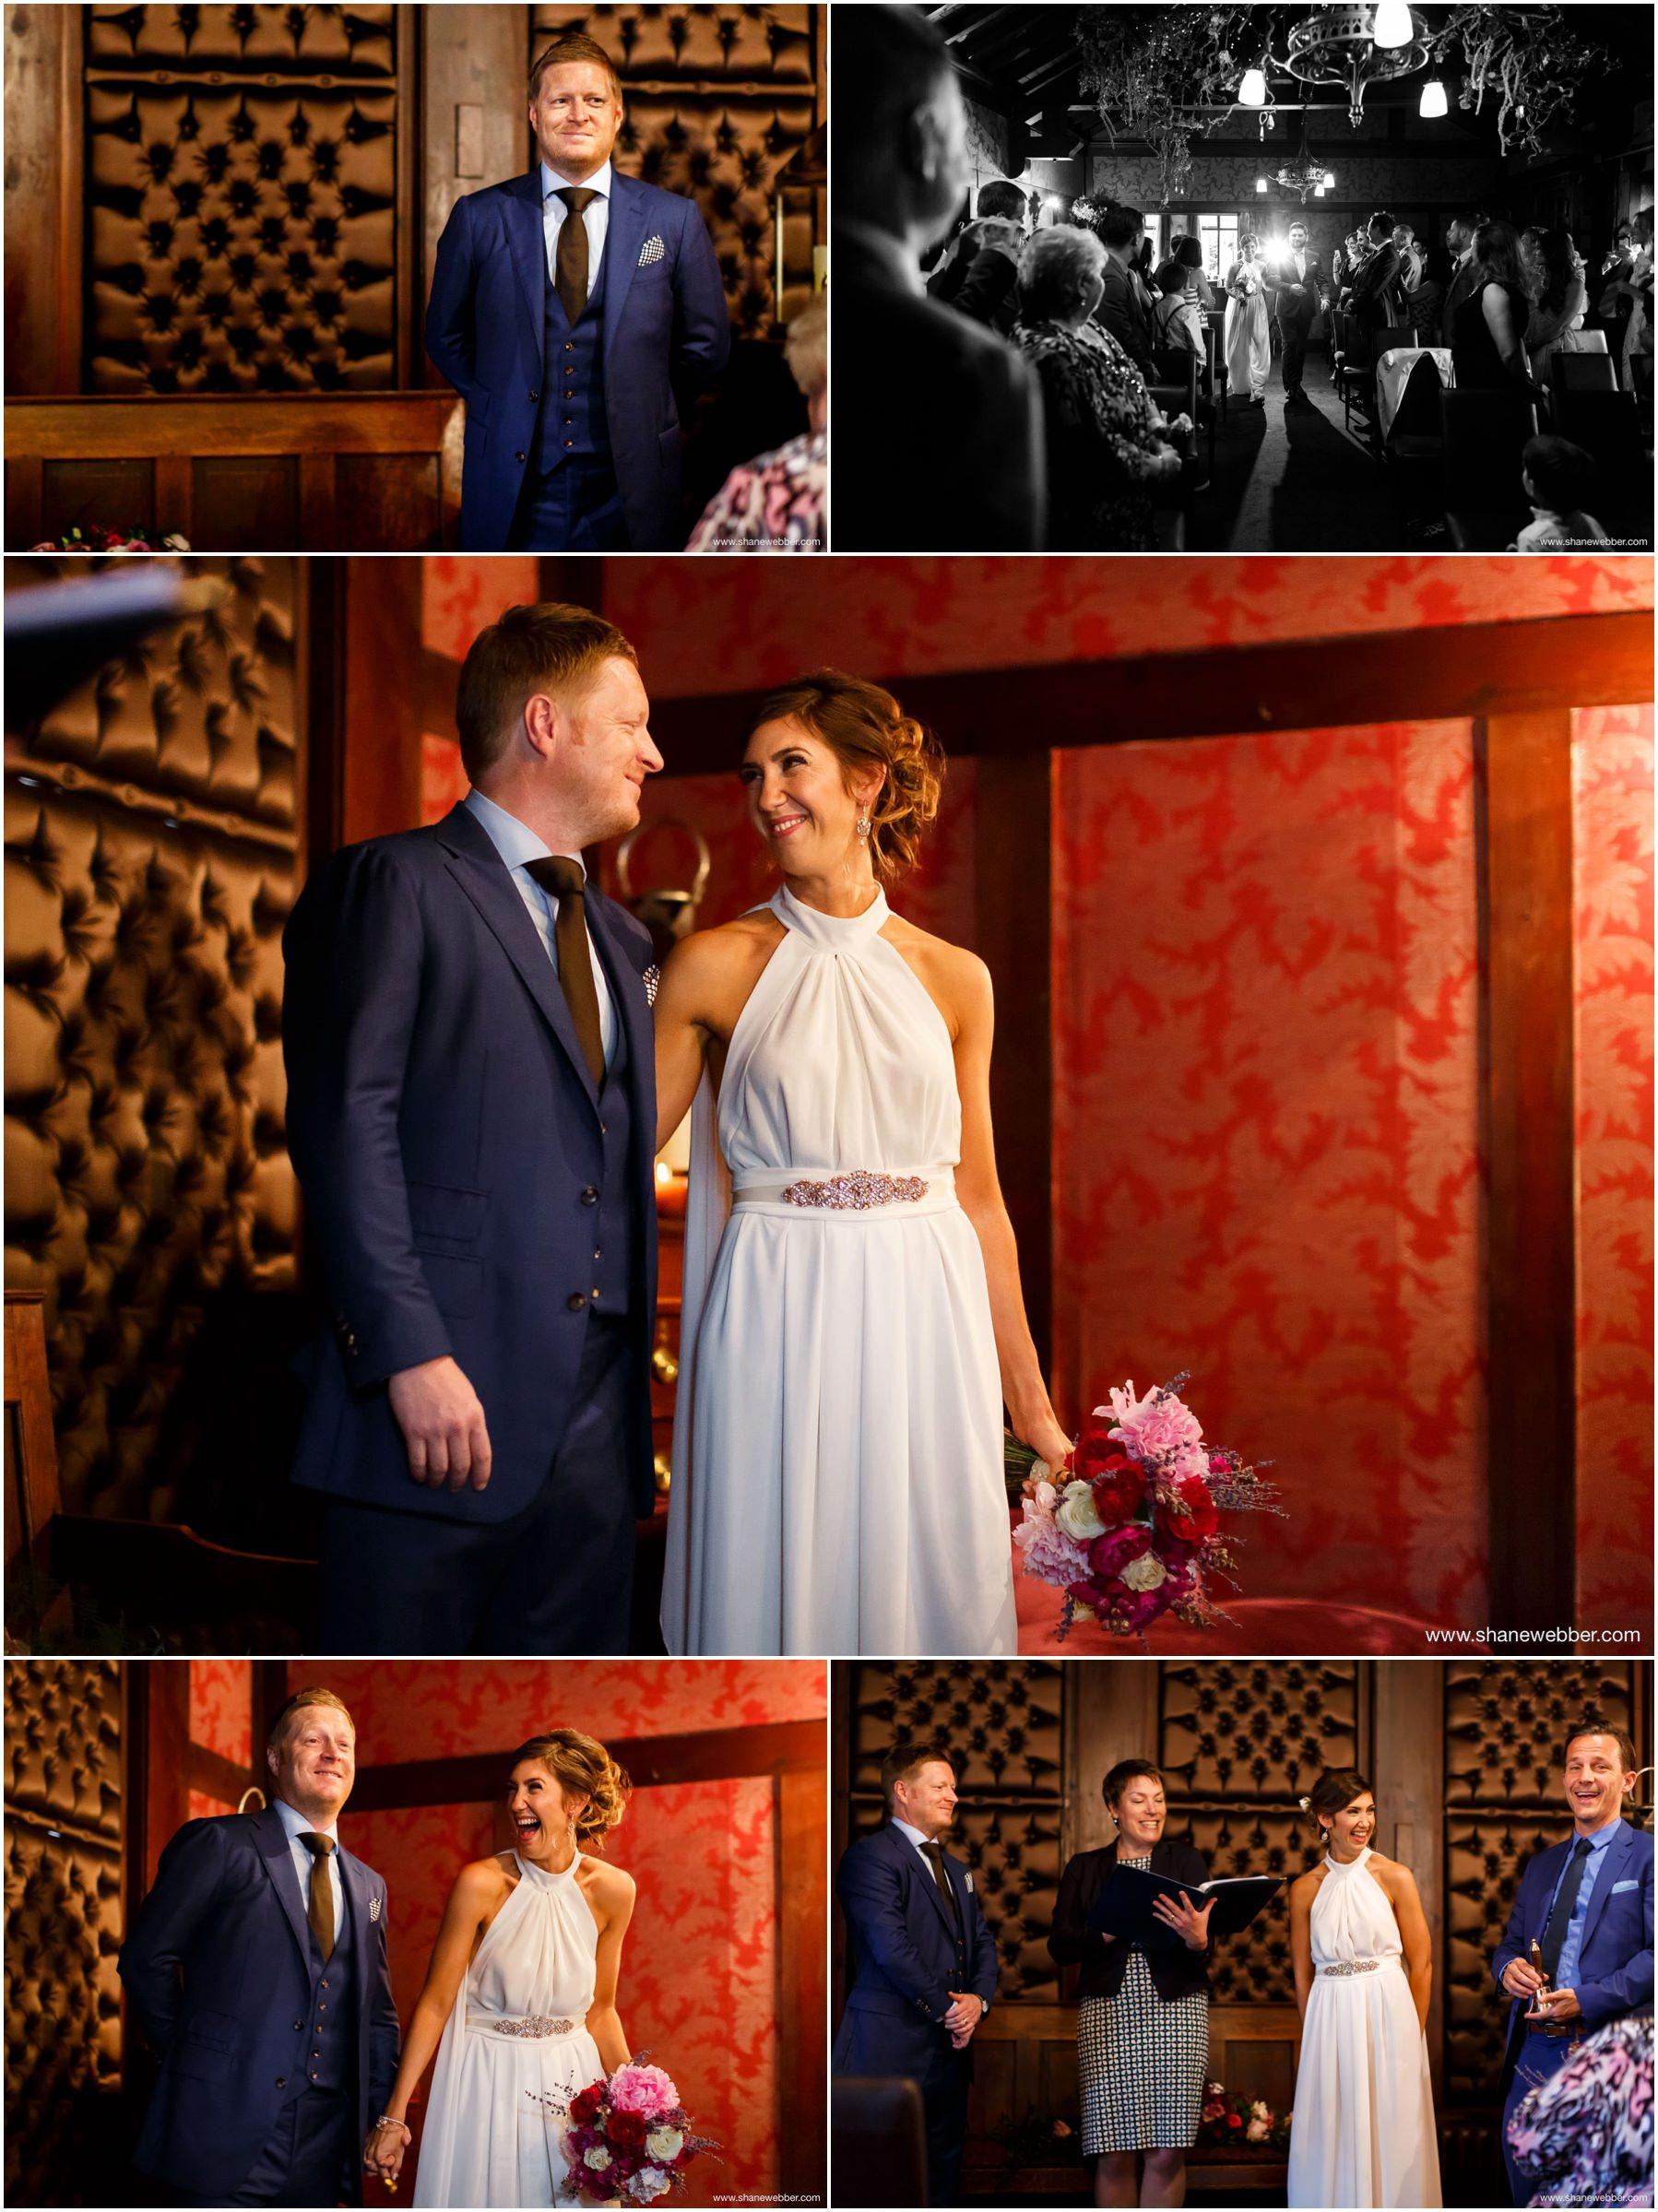 Wedding ceremony at Belle Epoque